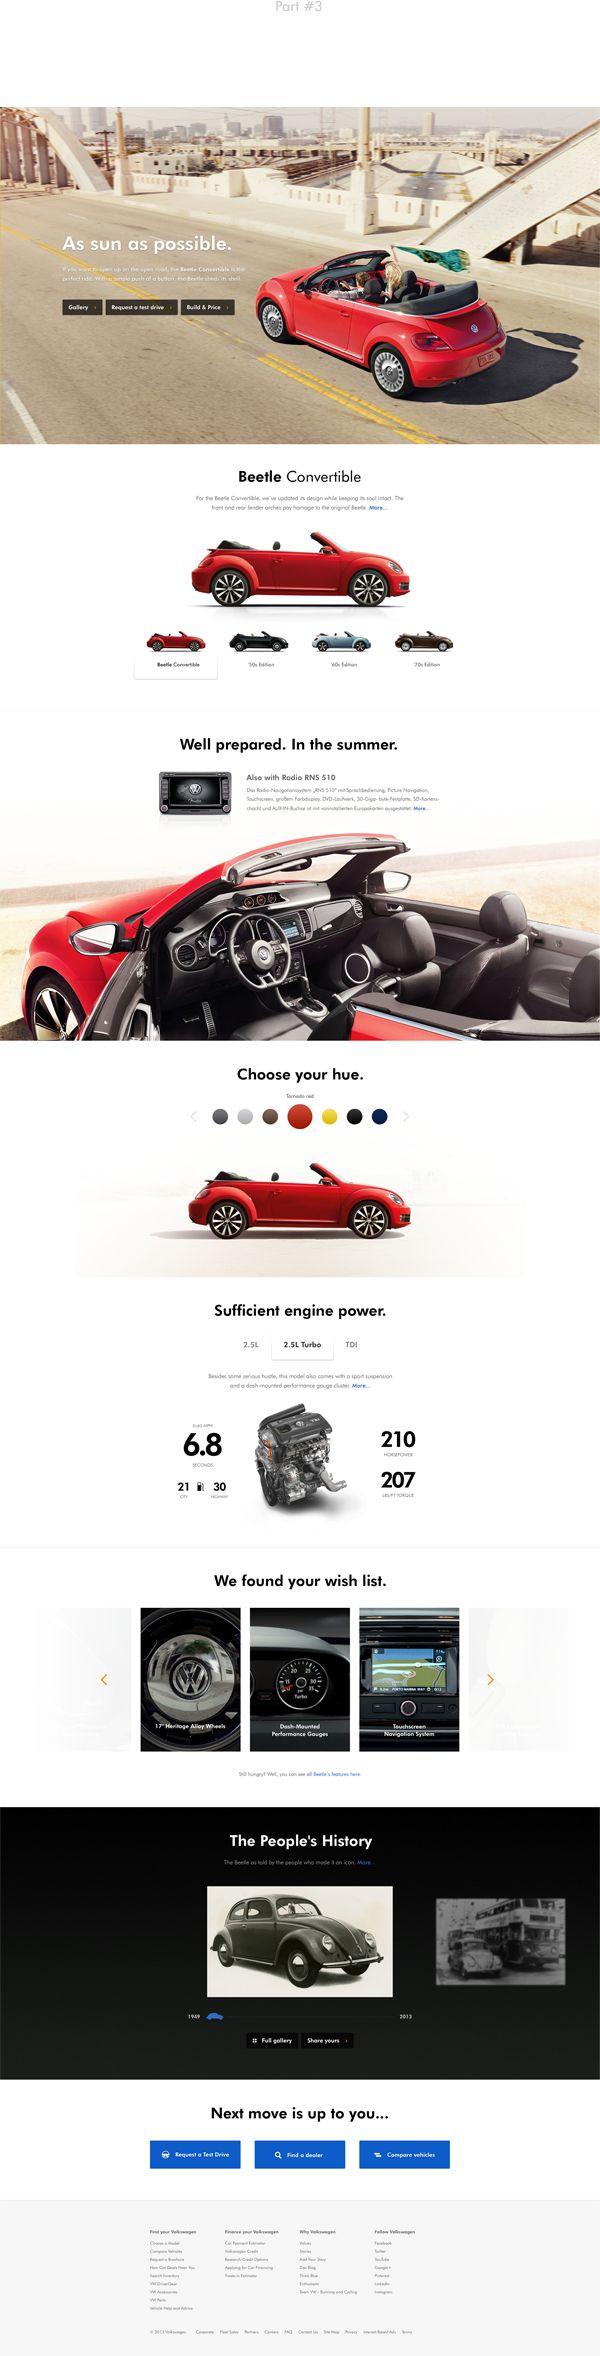 Volkswagen Website Redesign on Web Design Served